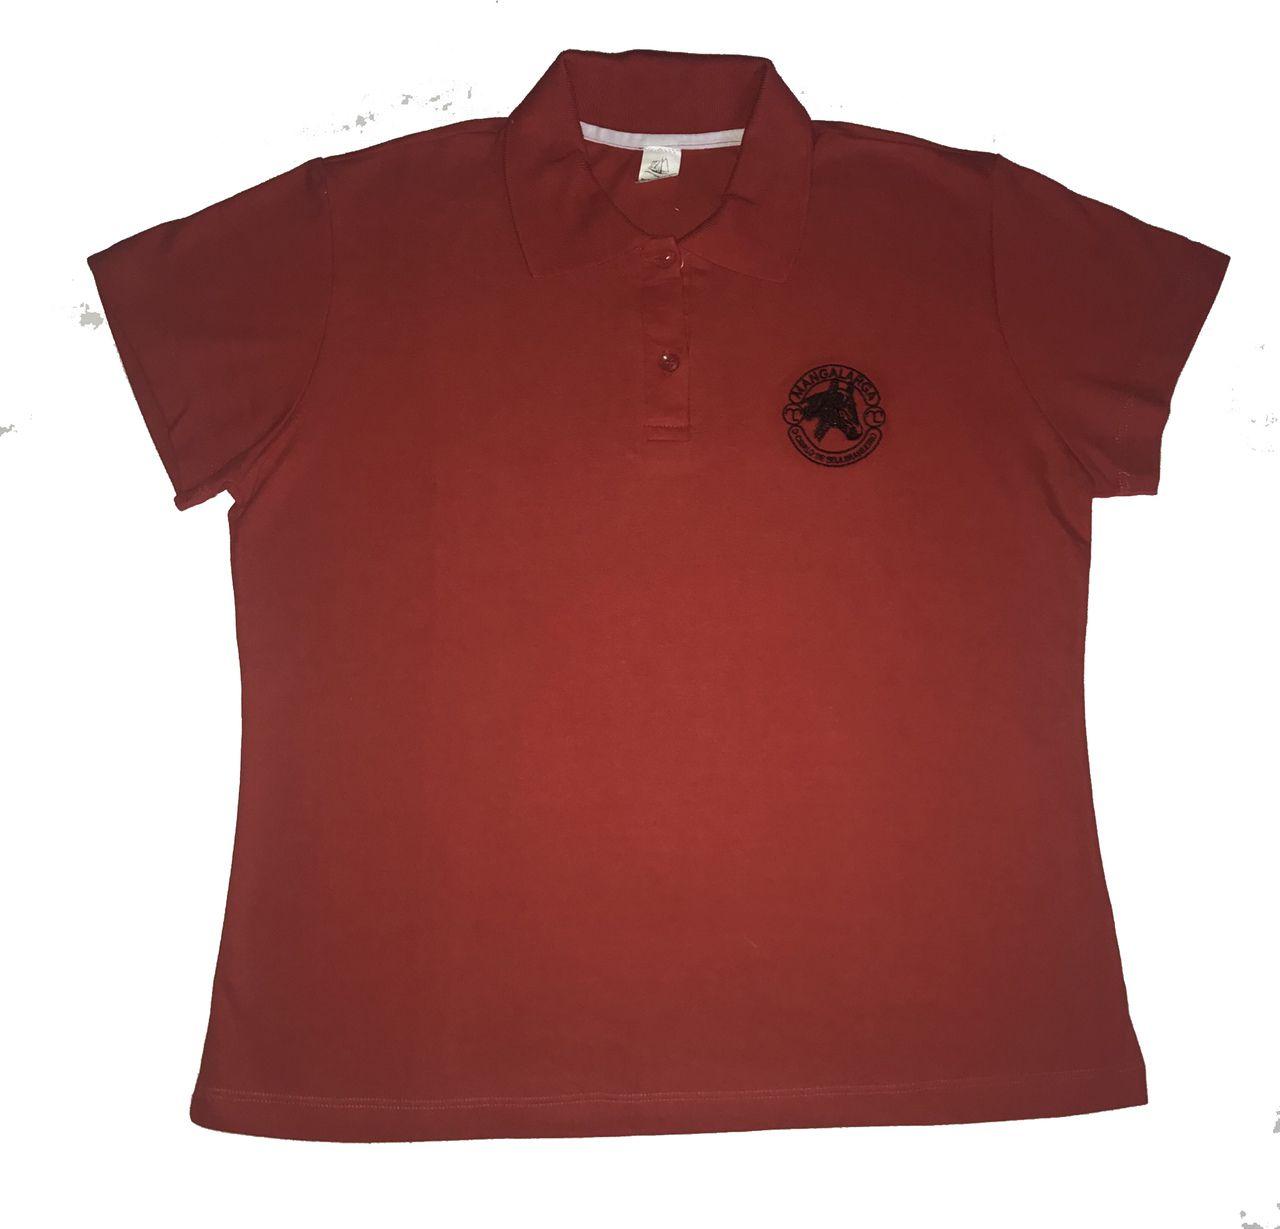 Camisa Polo Feminina Vermelha Logo Mangalarga  - Boutique Mangalarga